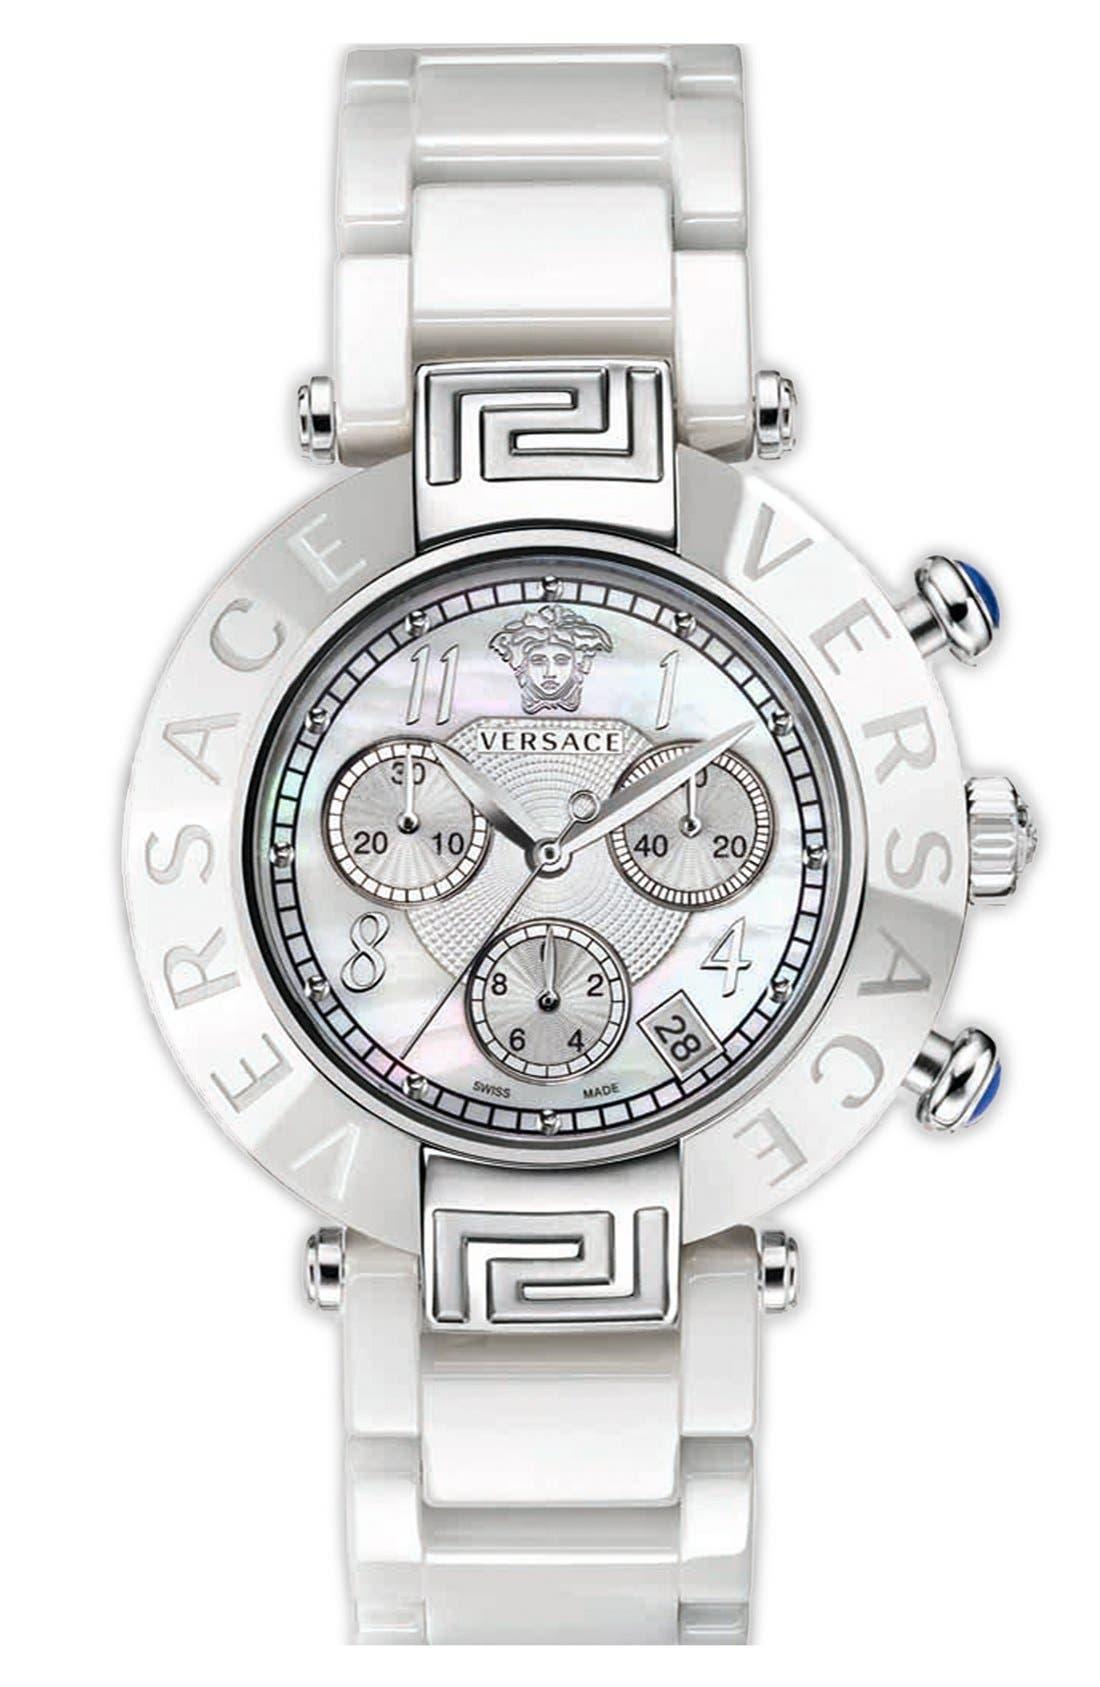 Main Image - Versace 'Reve Chrono' Ceramic Bracelet Watch, 40mm